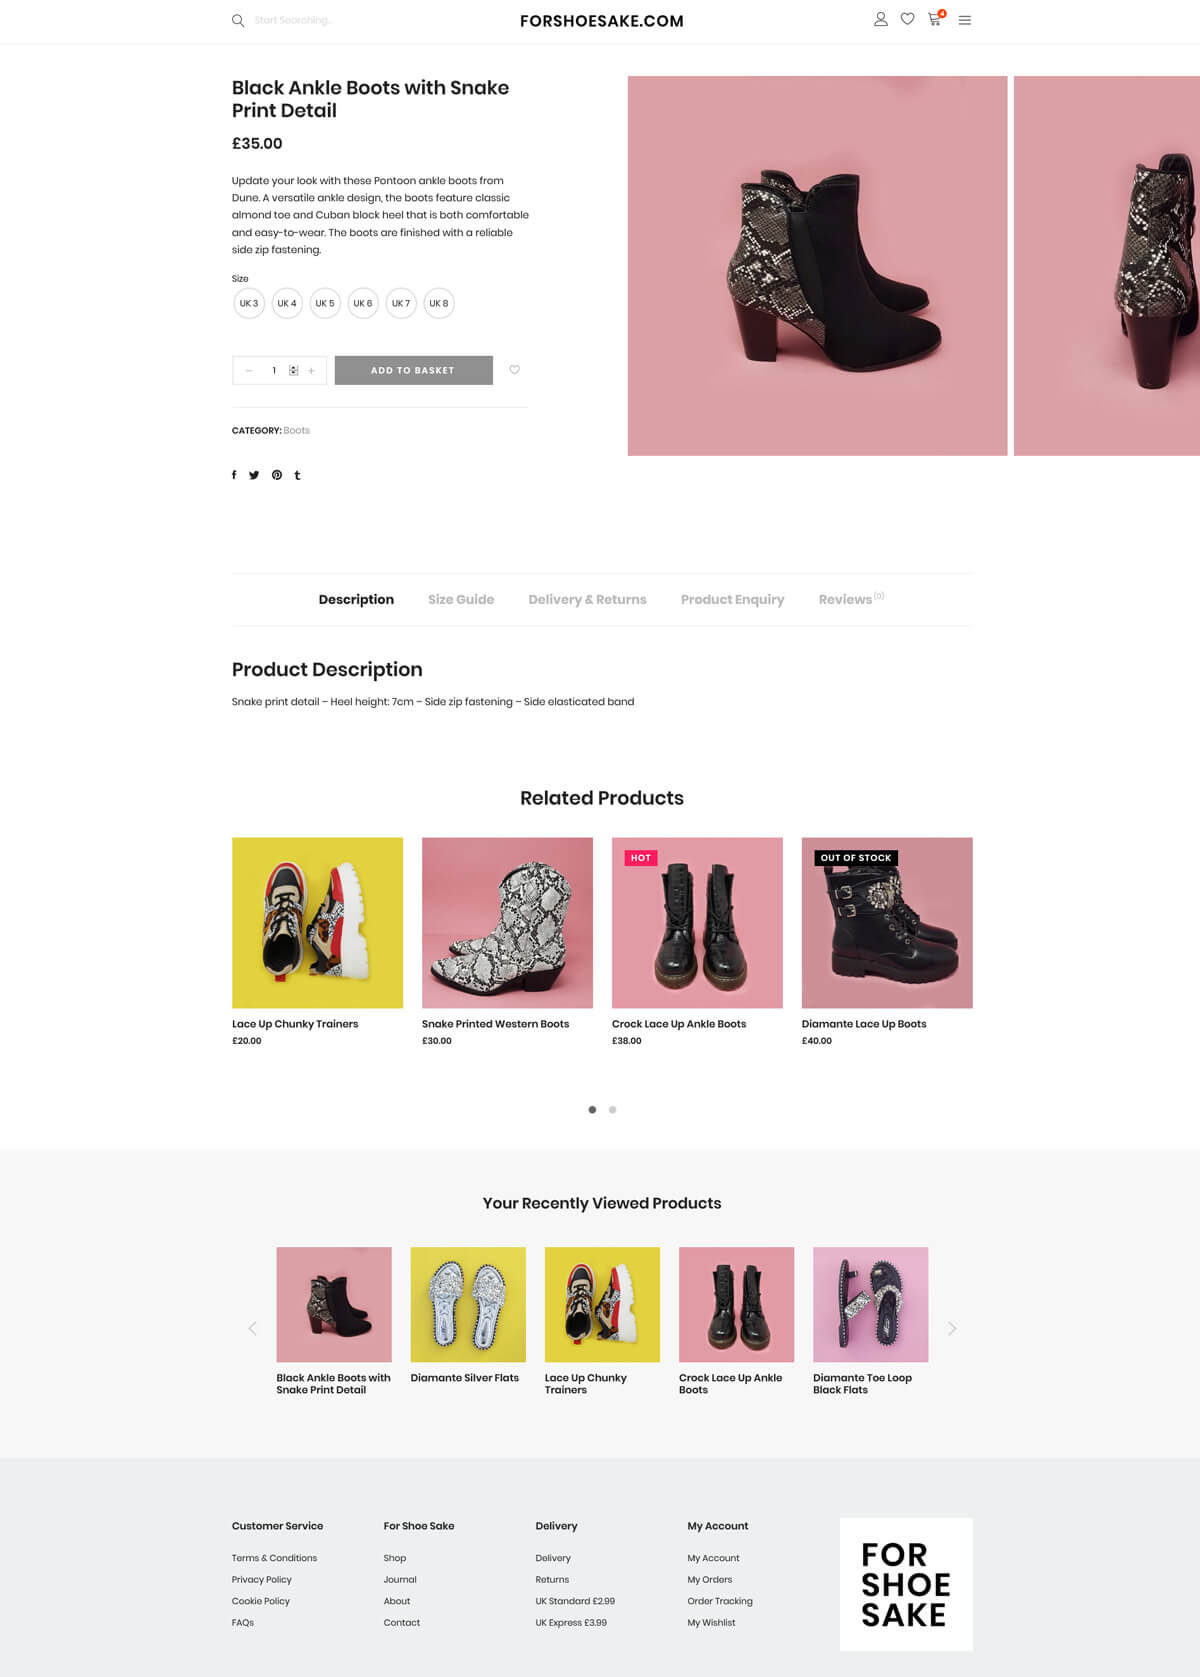 For Shoe Sake - forshoesake.com - Case Study 5 - developed by Digital Artifacts Creative